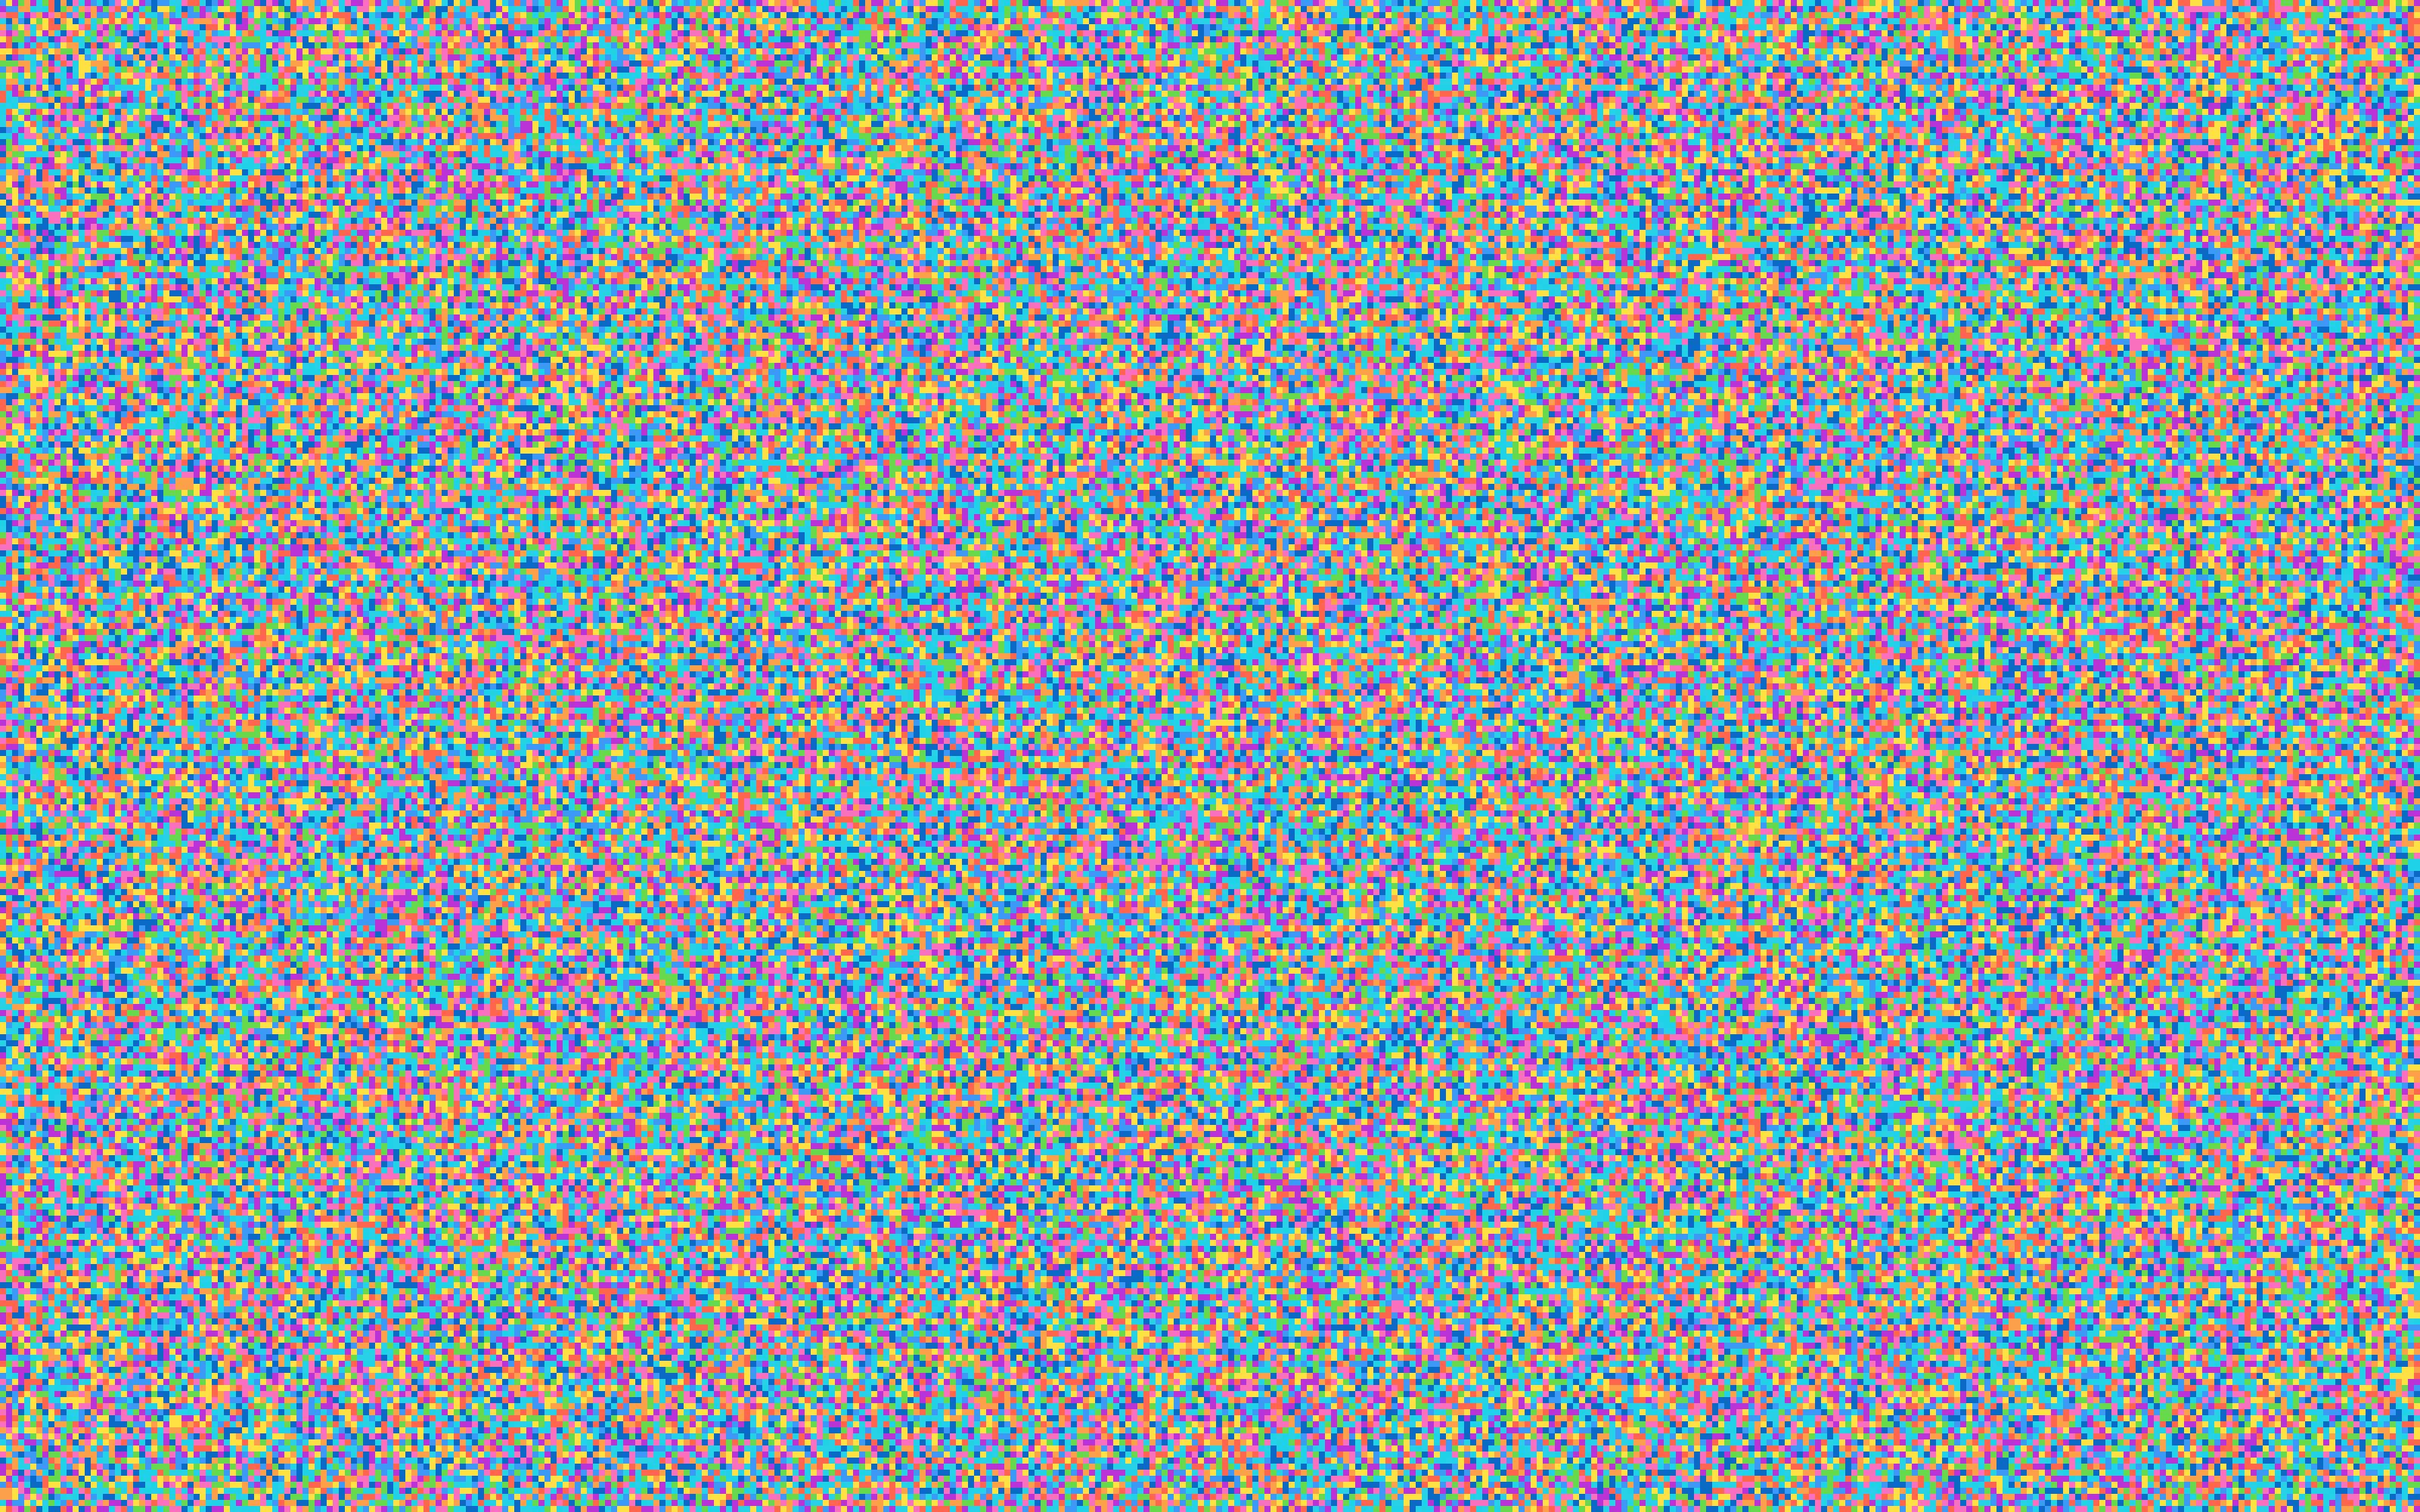 100,000 digits of tau